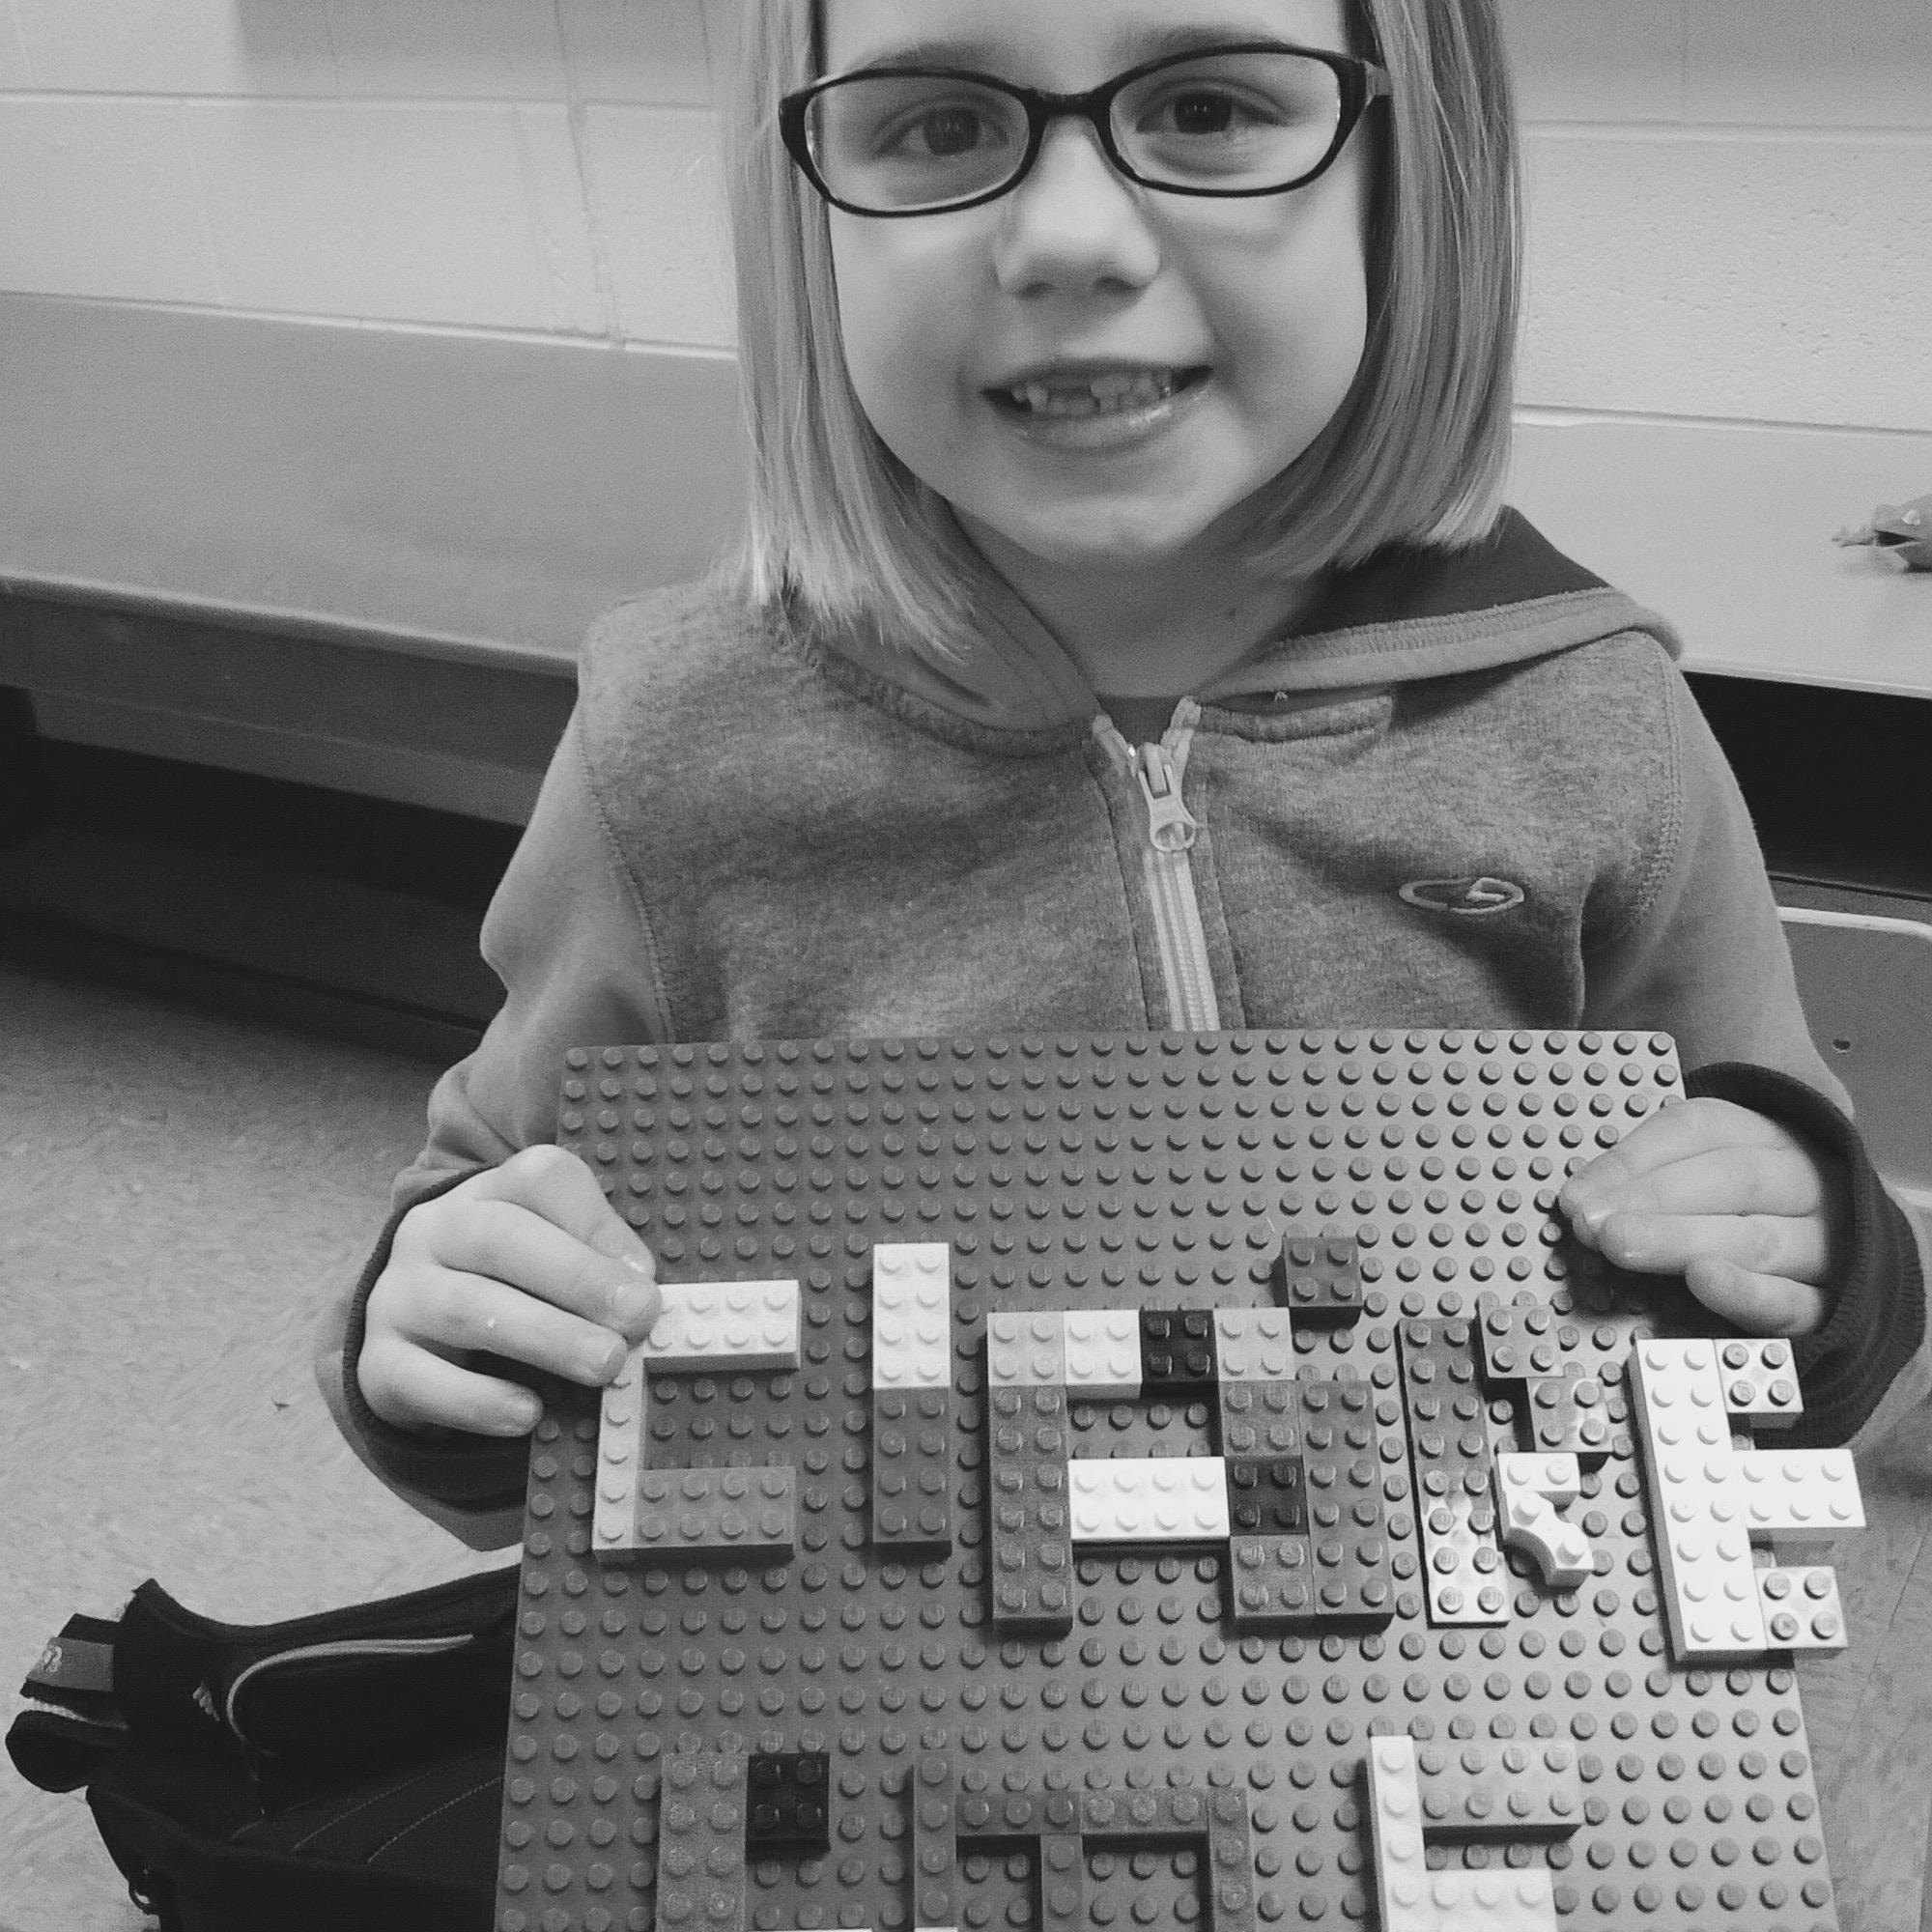 <--- Back to LEGO Activity Ideas